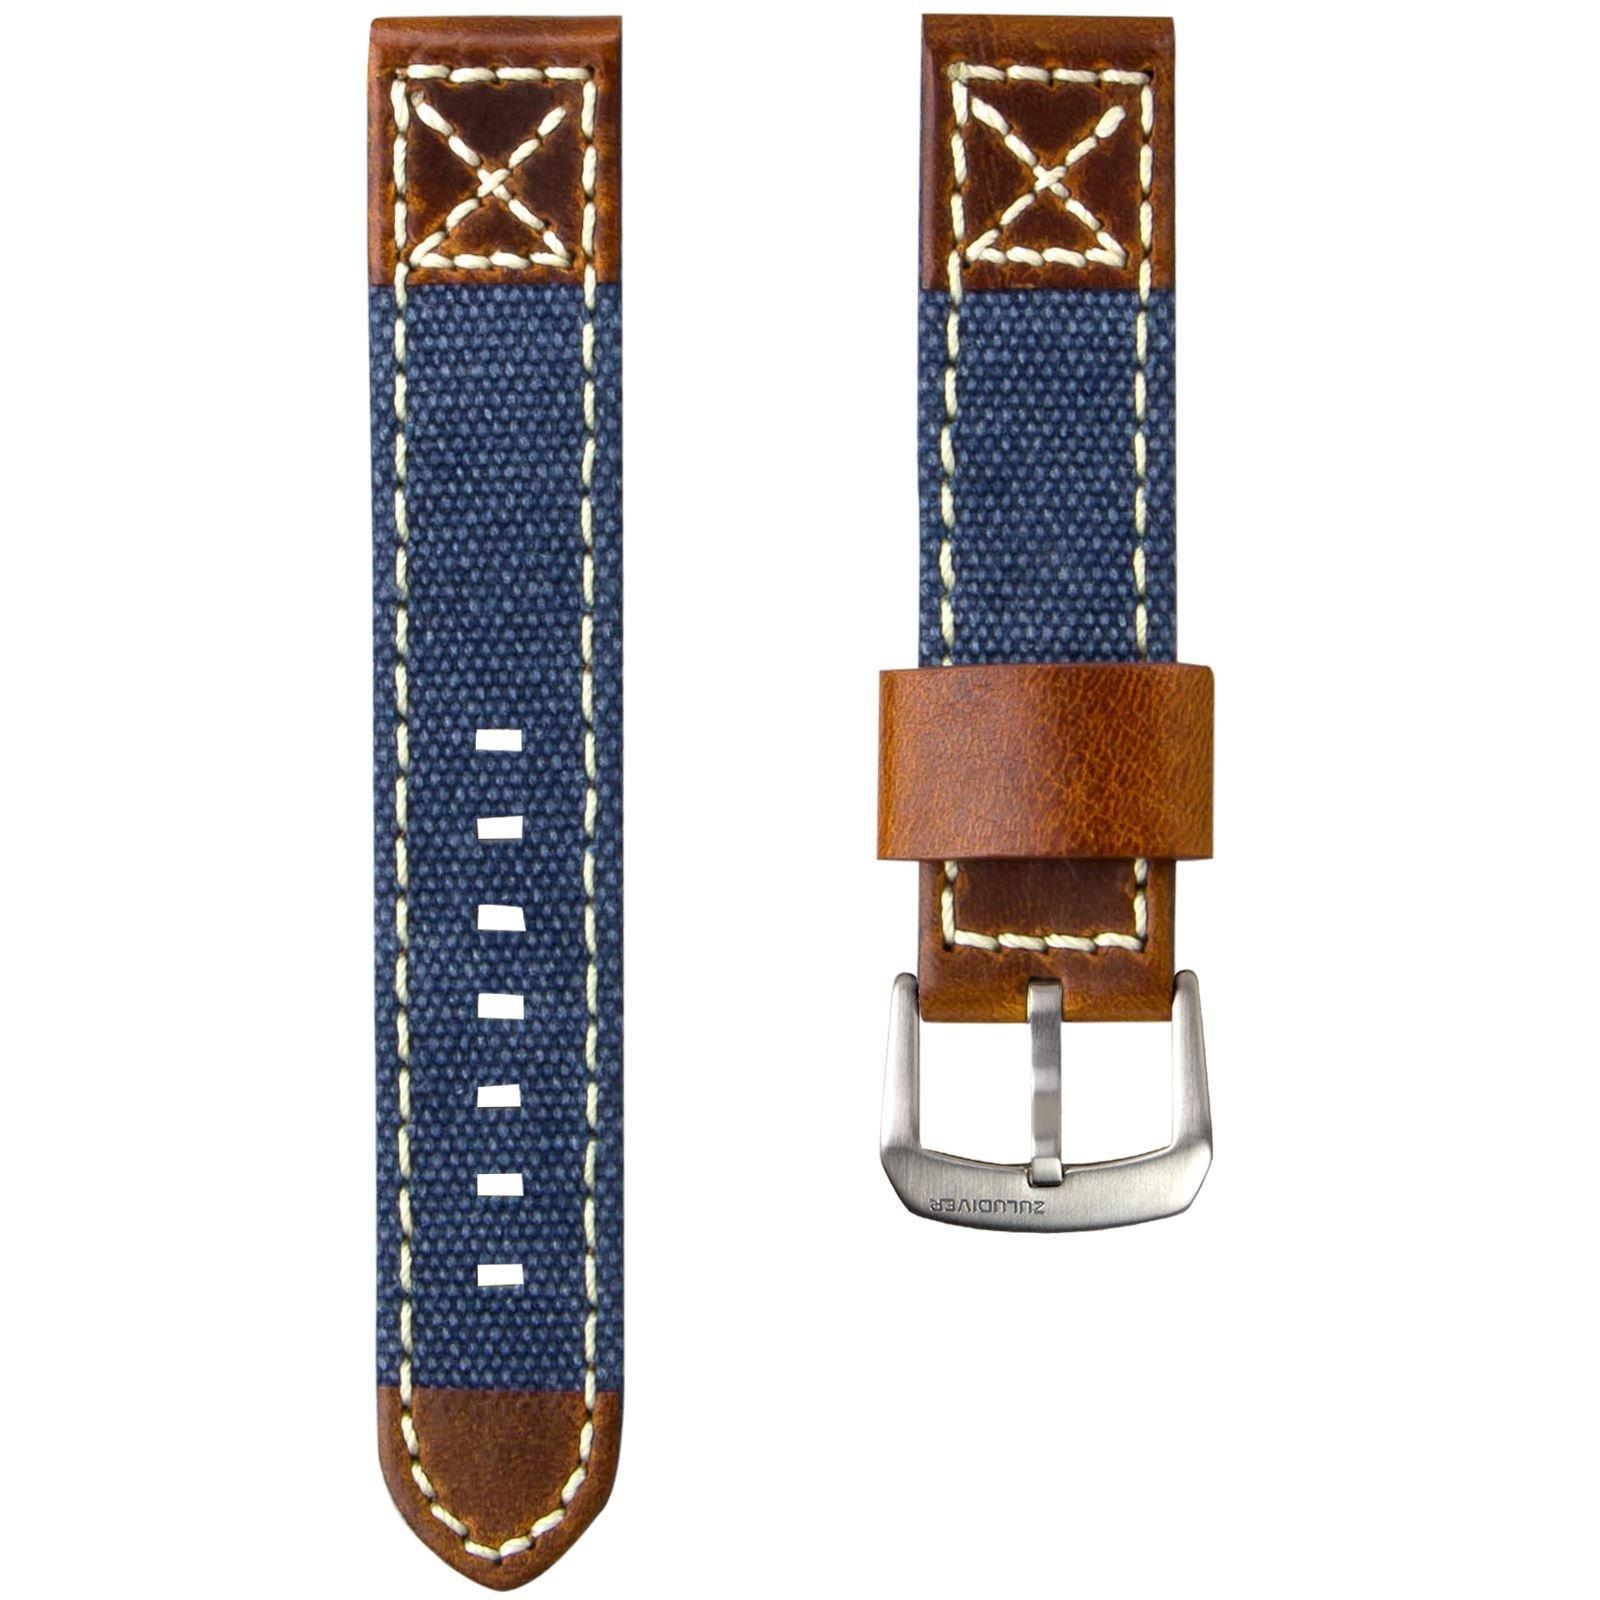 ZULUDIVER Canvas & Italian Leather Watch Strap, Navy Blue & Vintage Brown, 20mm